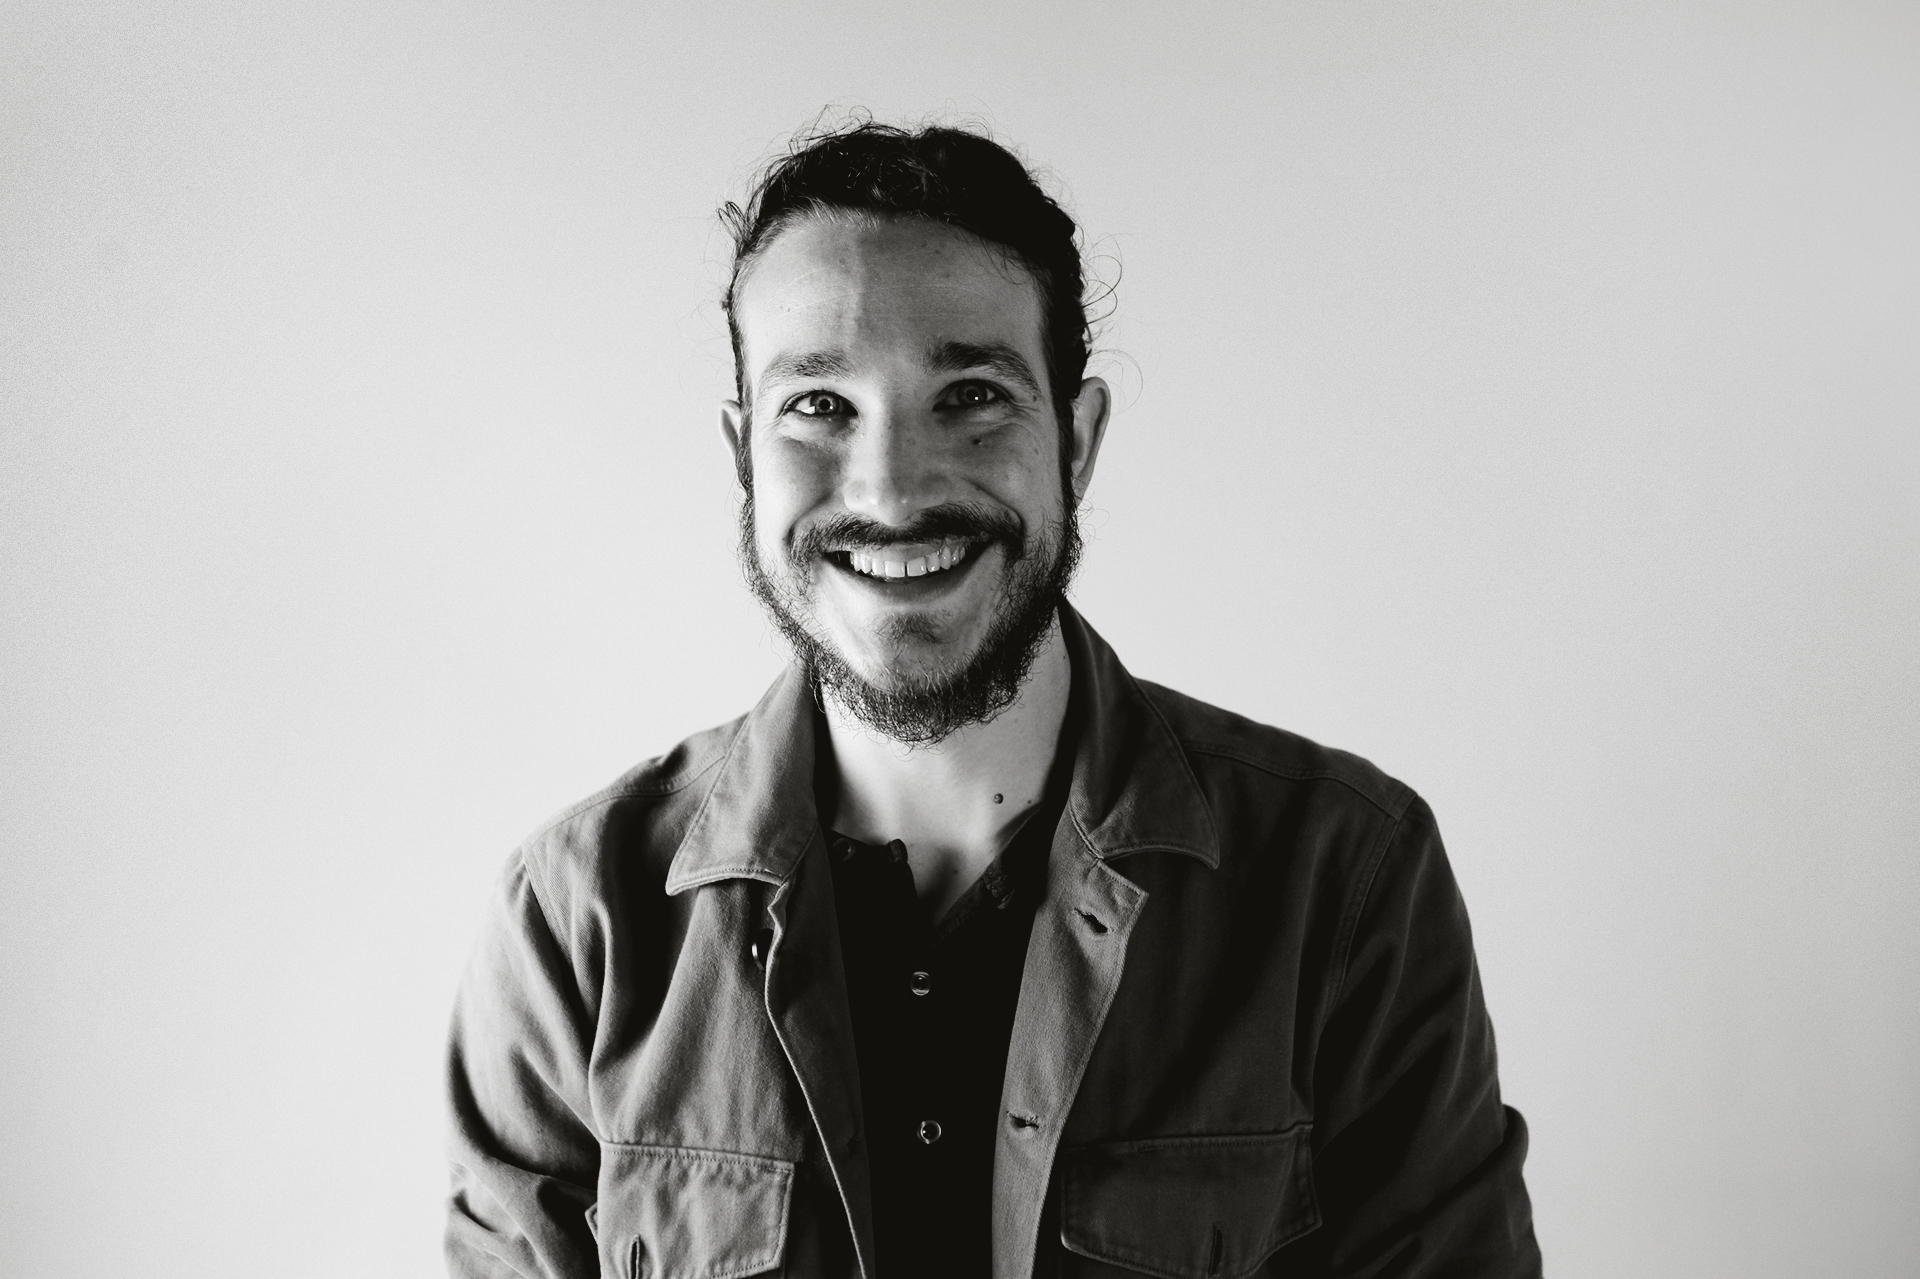 Damiano Frison